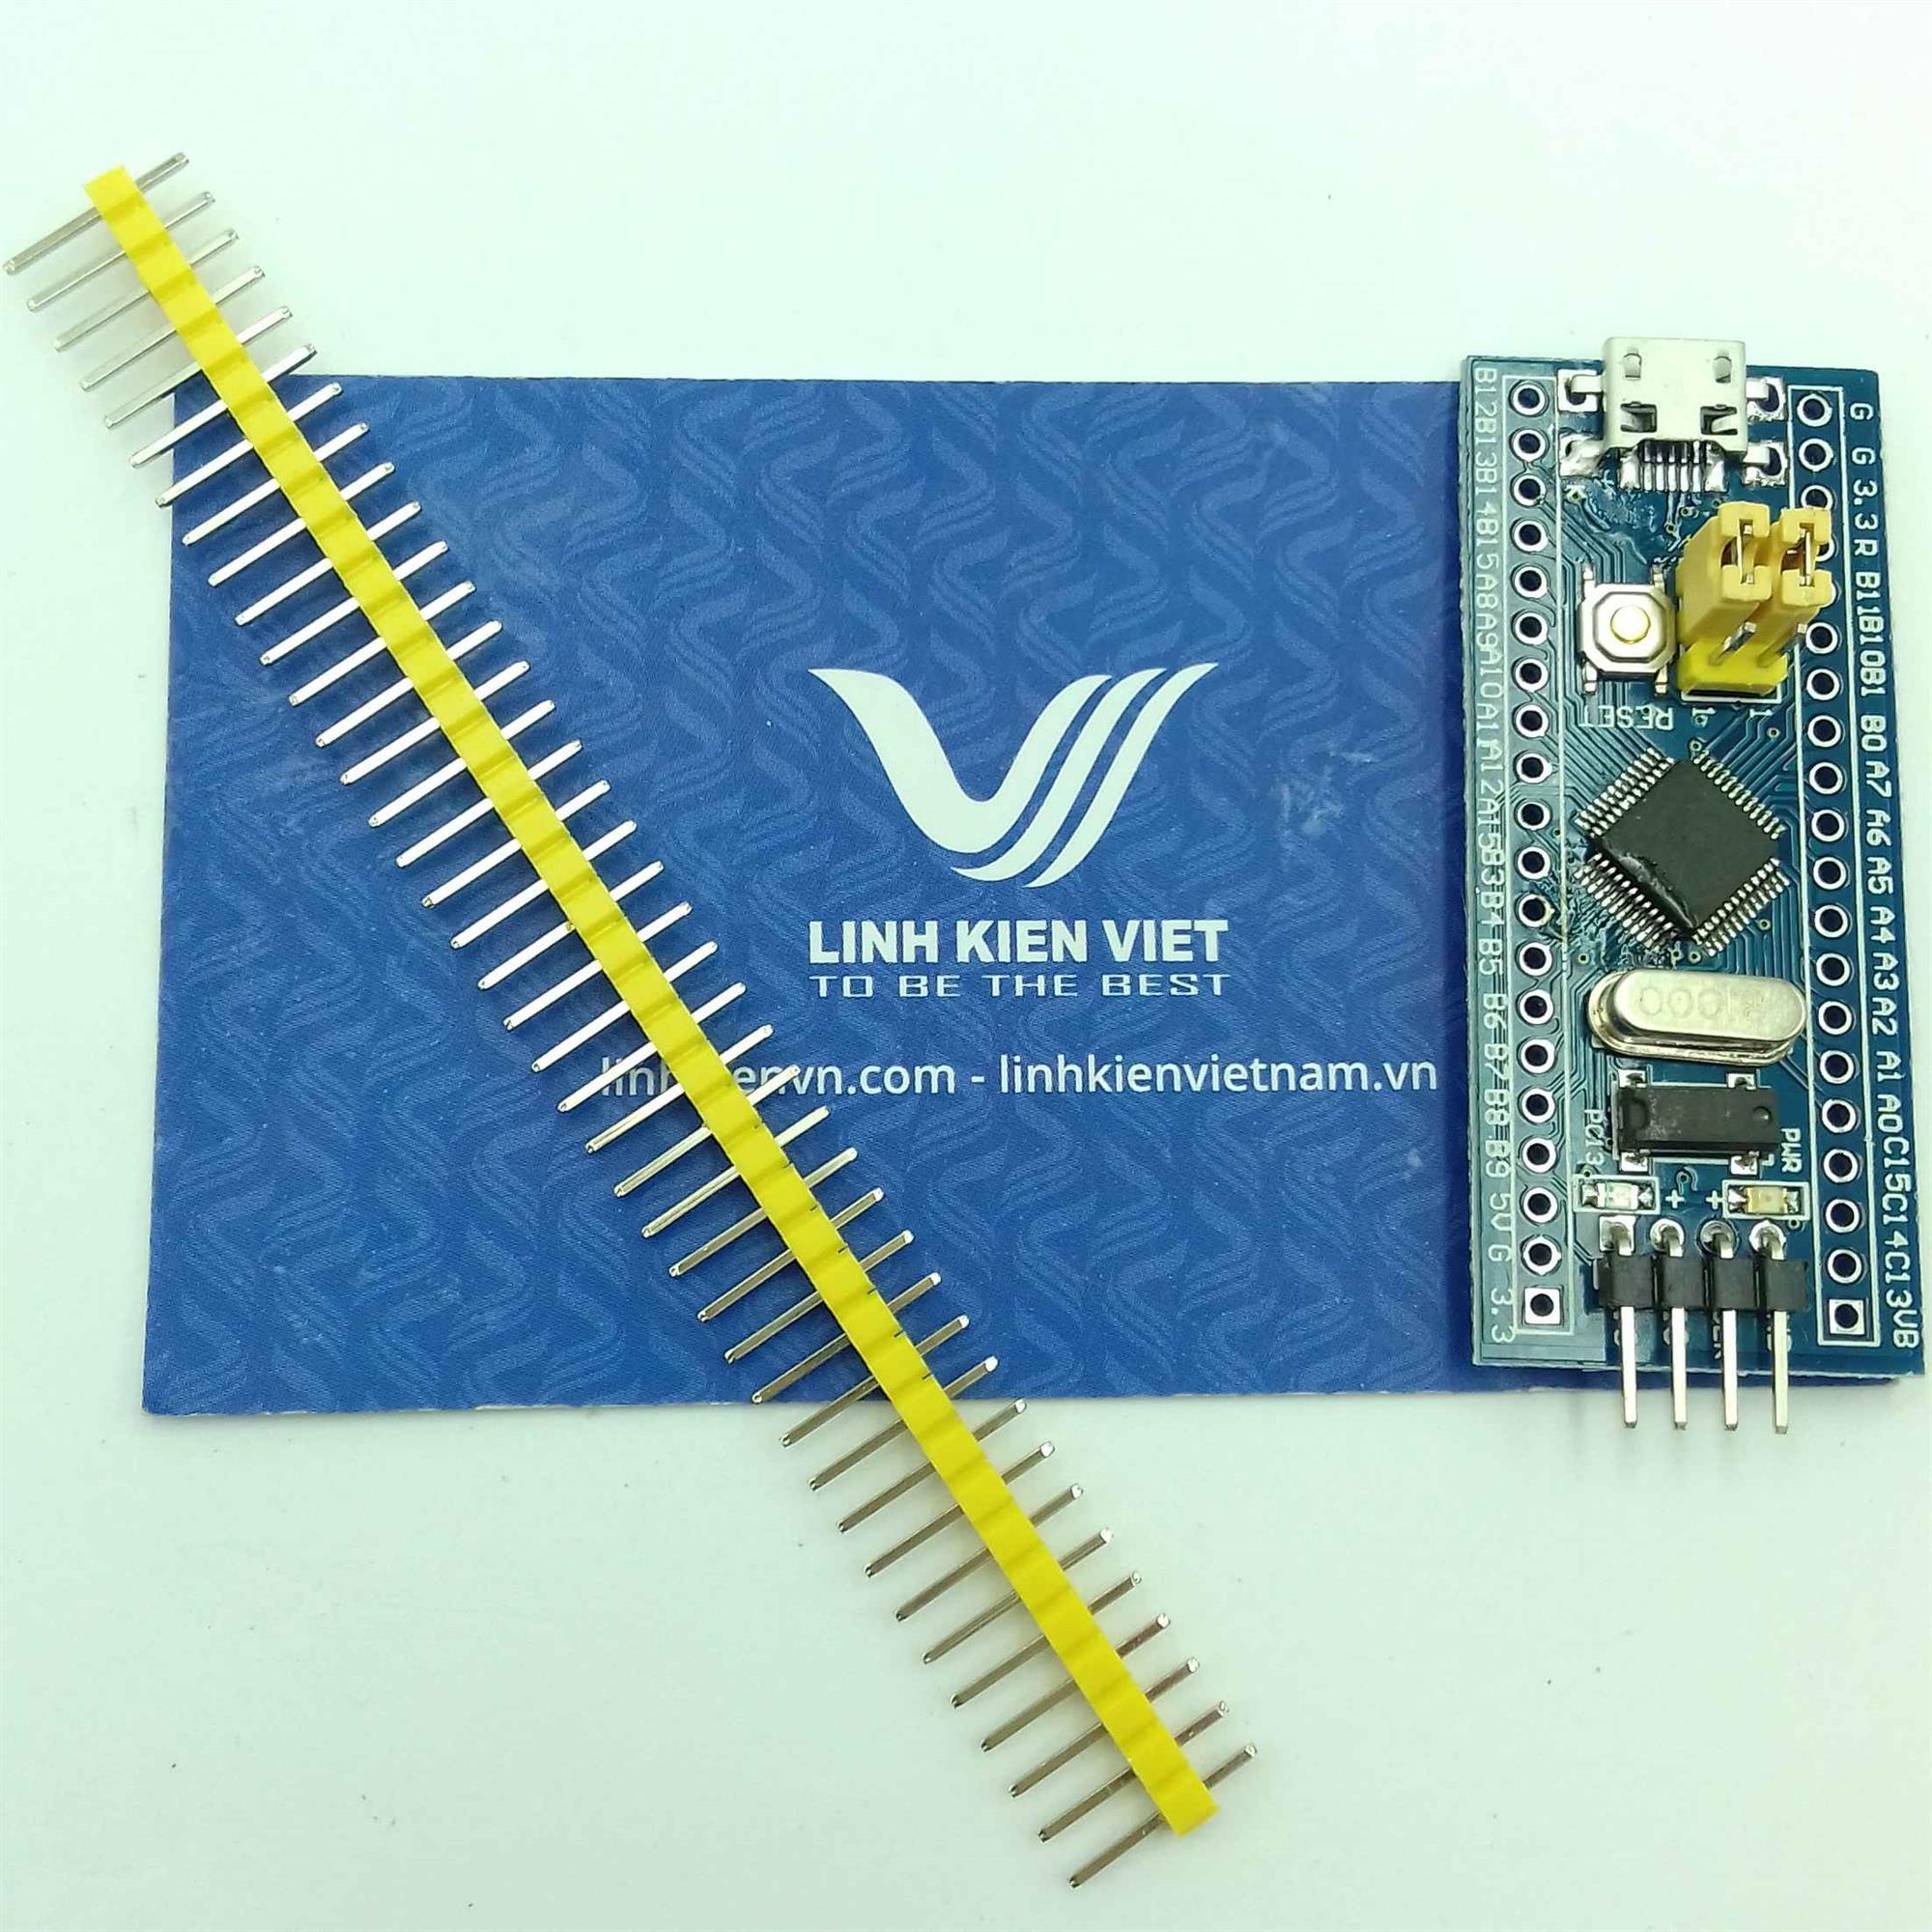 kit phát triển STM32F103C8T6 / Module STM32F103C8T6 - i5H11